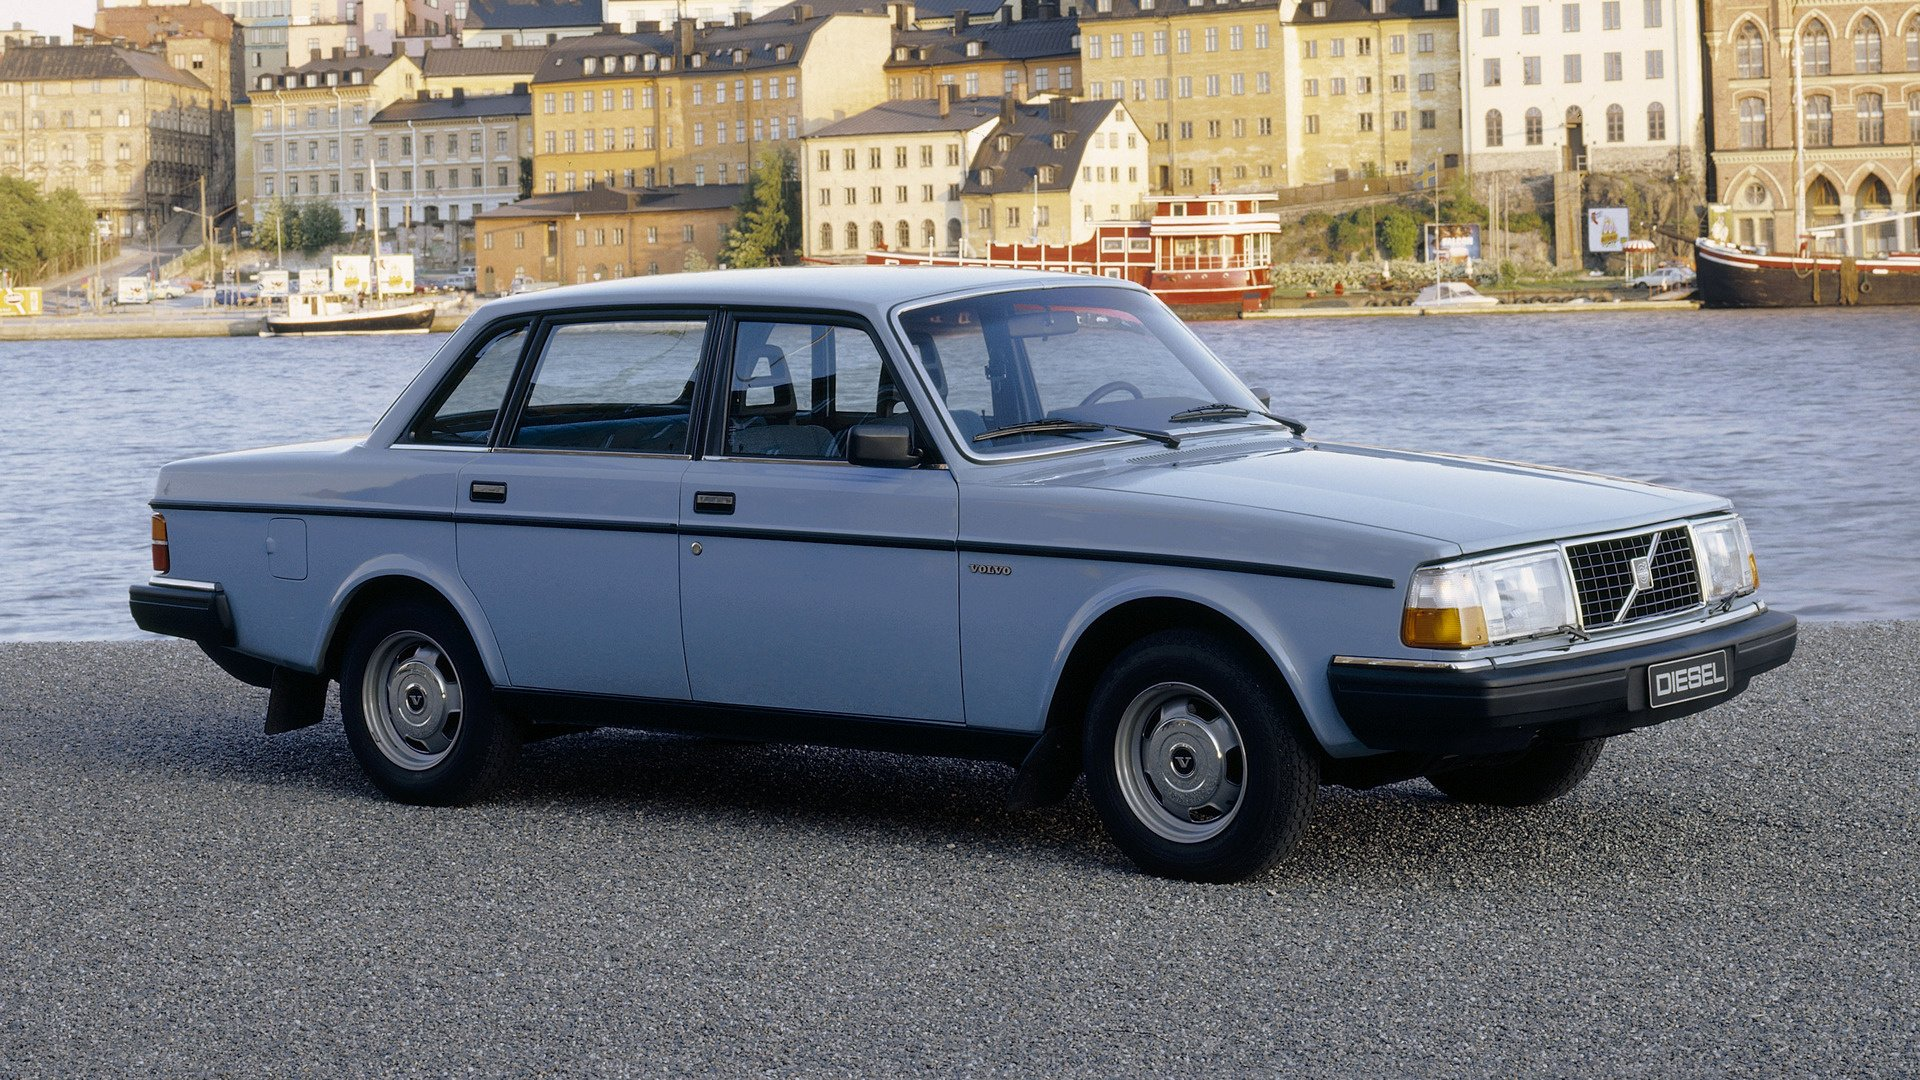 1980 Volvo 244 Diesel Fond Décran Hd Arrière Plan 1920x1080